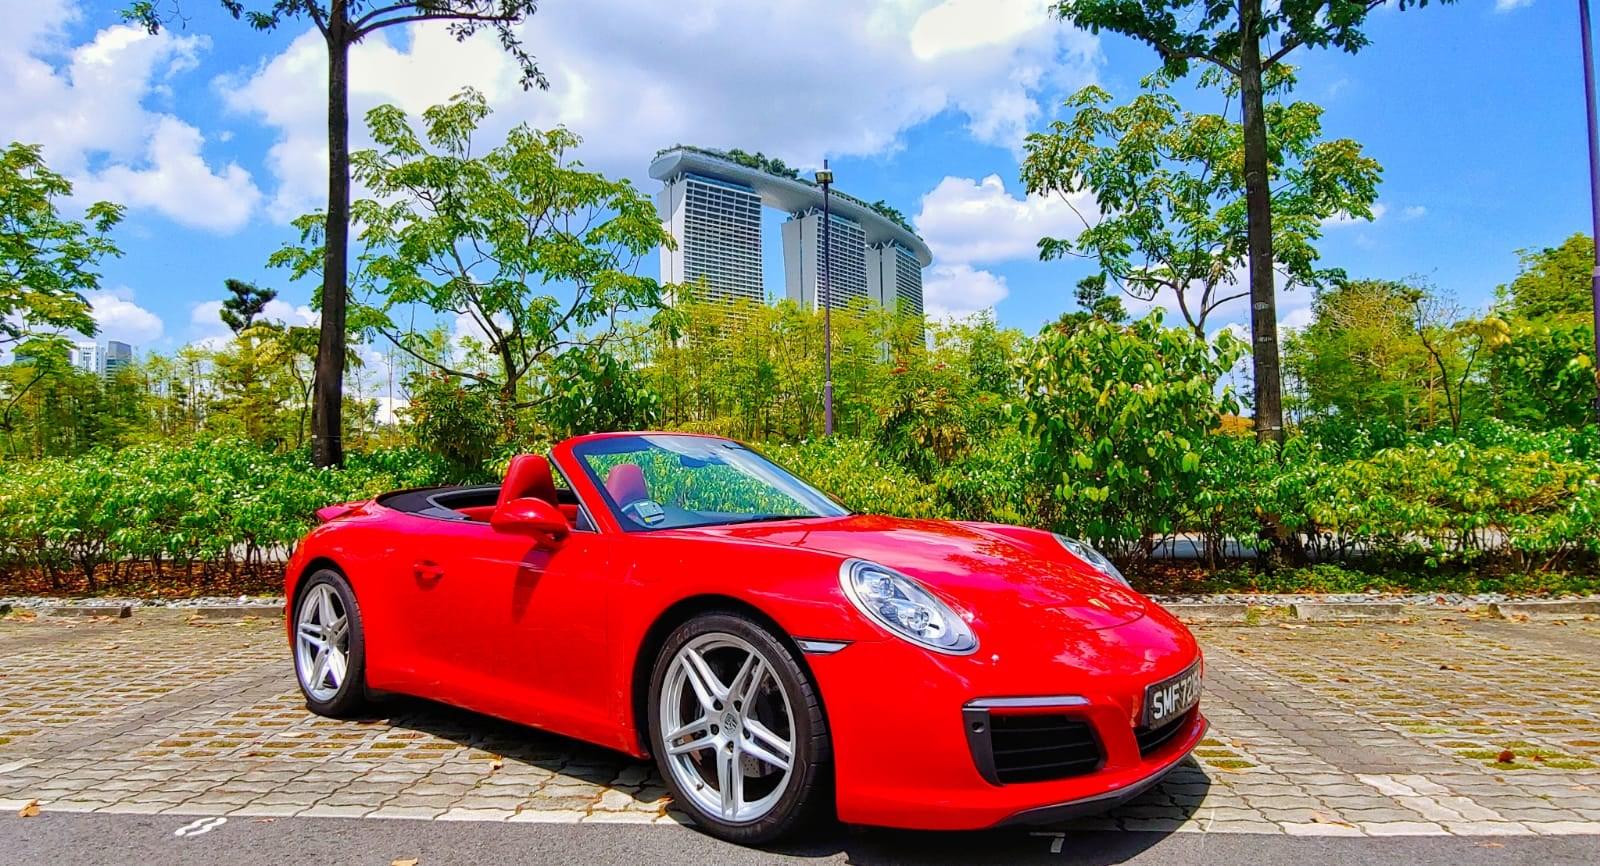 Trải nghiệm lái Siêu Xe - Ferrari